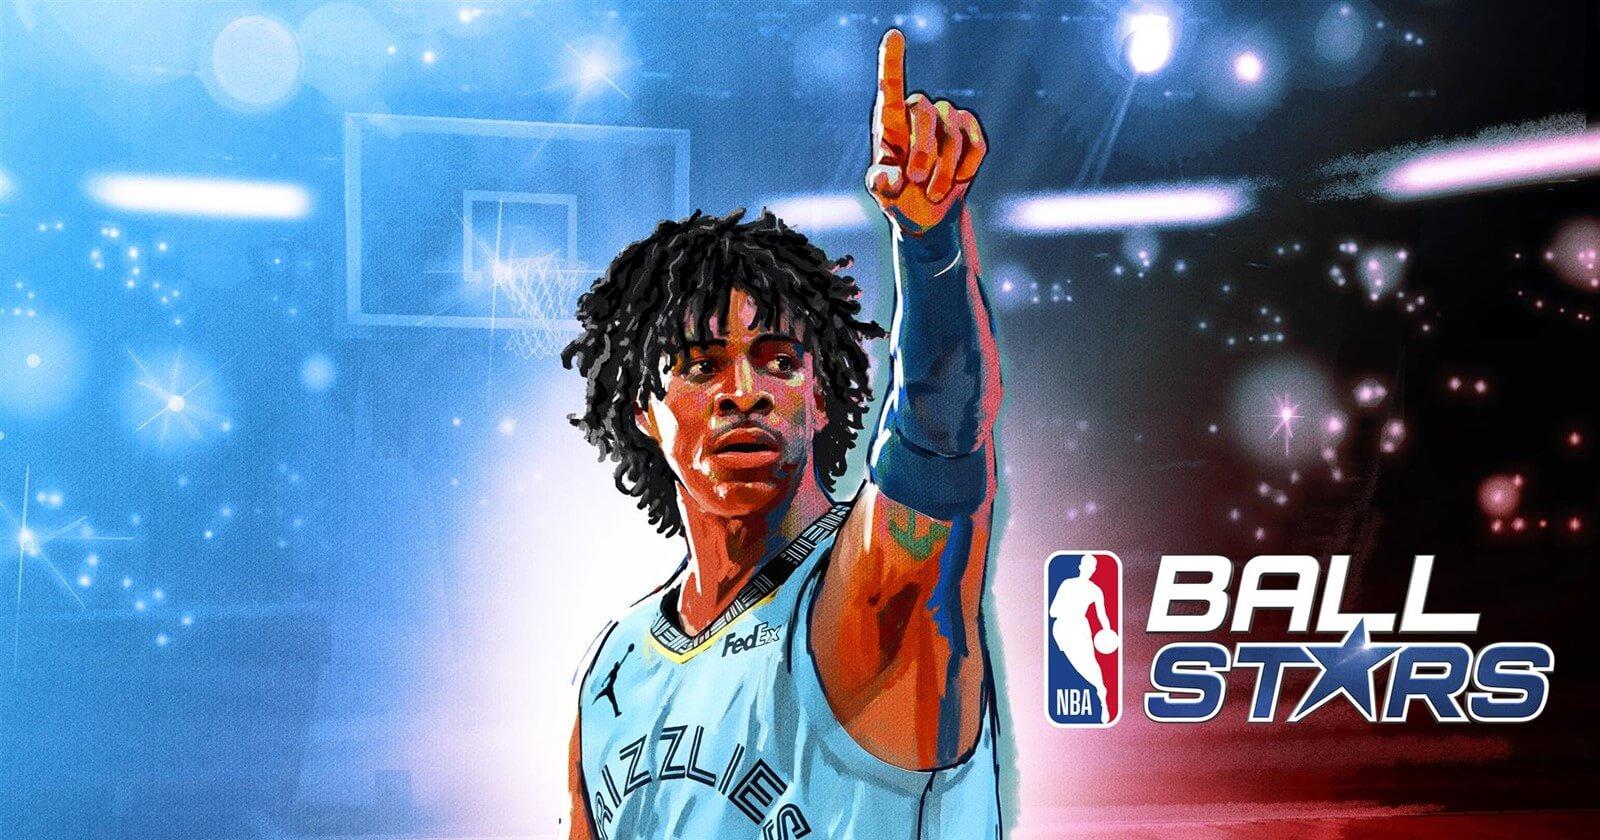 Netmarble and Kung Fu Factory Announce NBA Ball Stars image